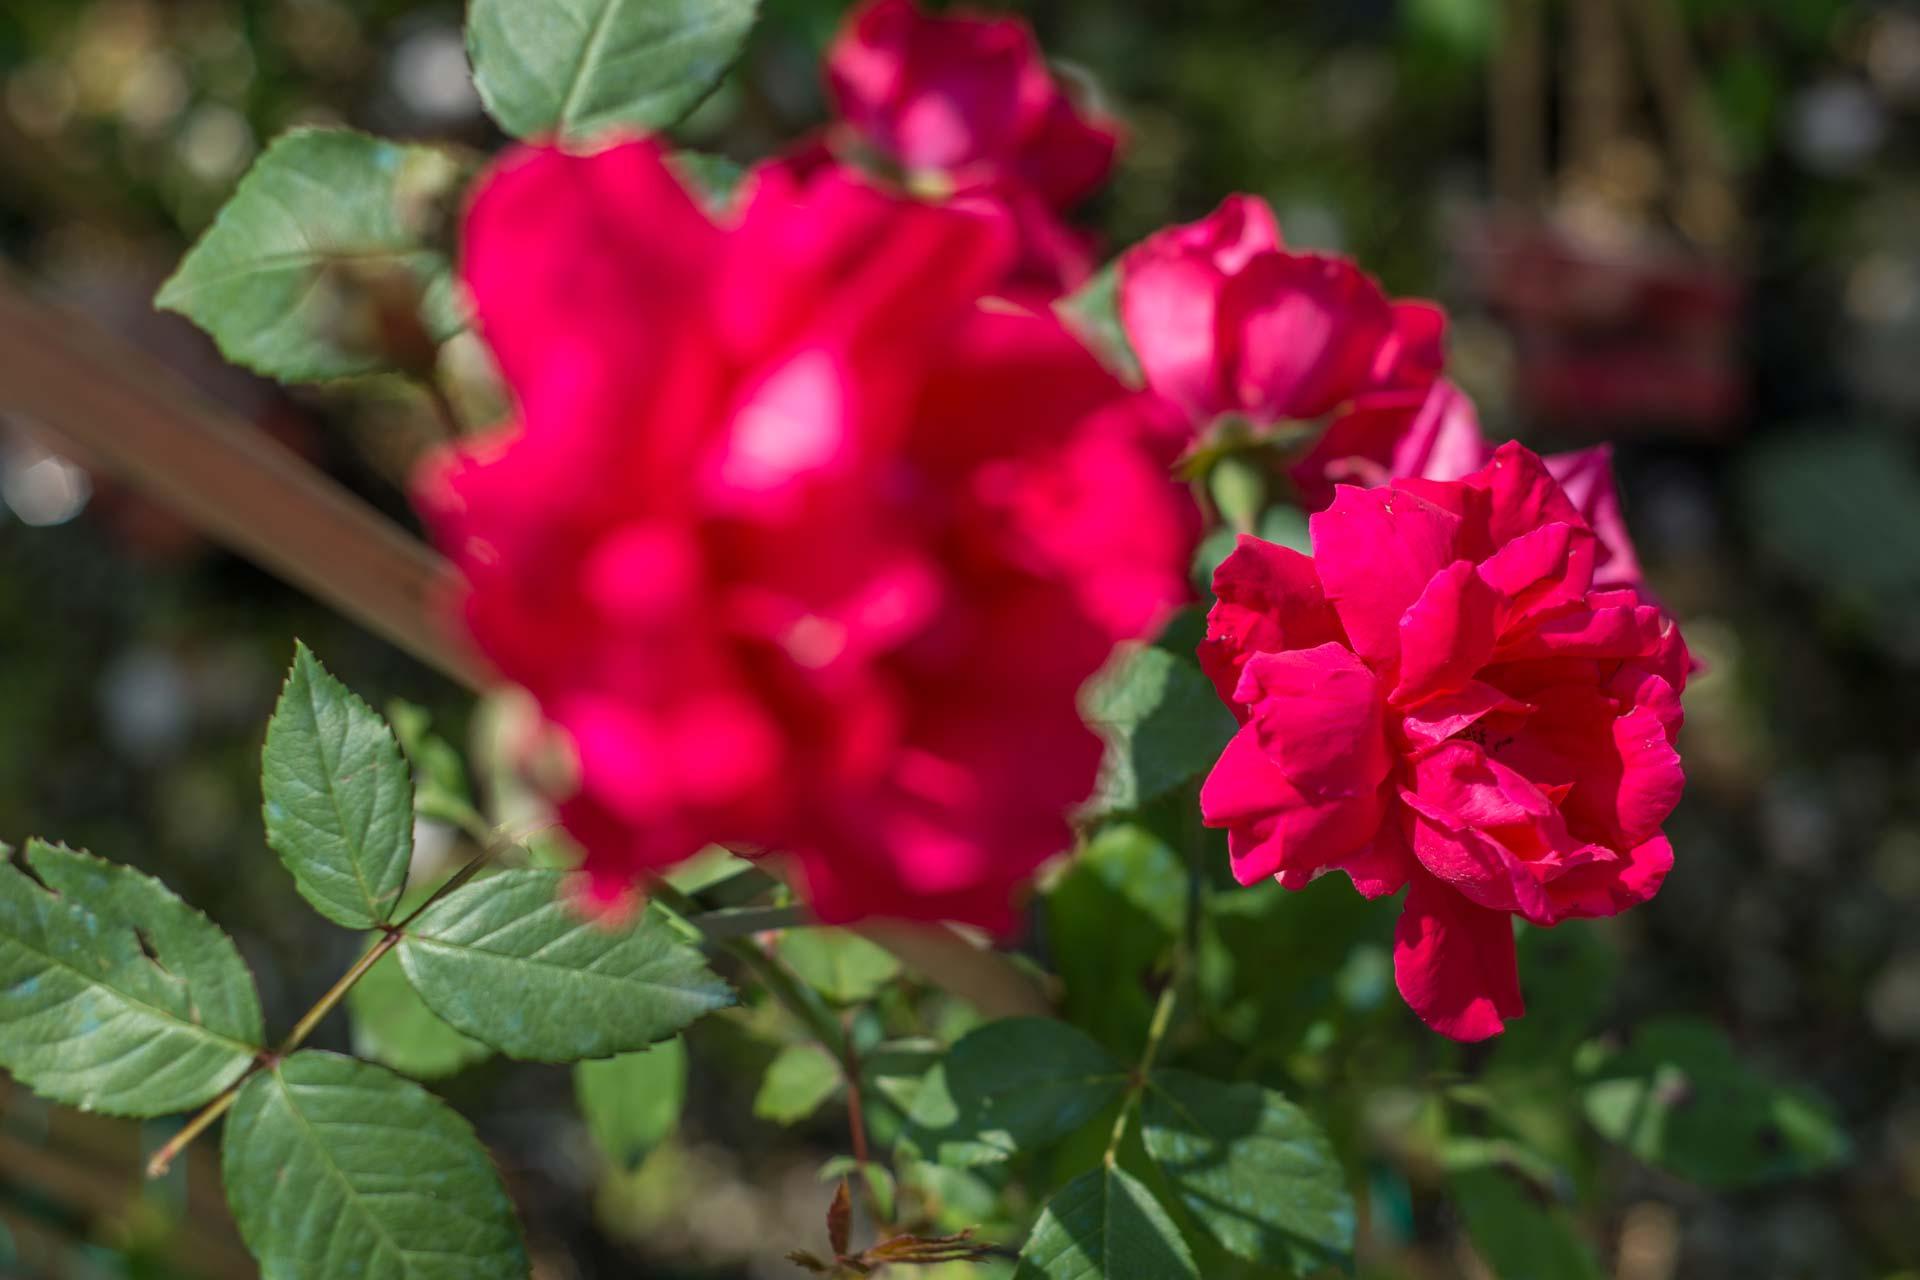 https://www.salmasogarden.it/wp-content/uploads/2020/11/foto-dettaglio-giardino-con-aiuola-3.jpg